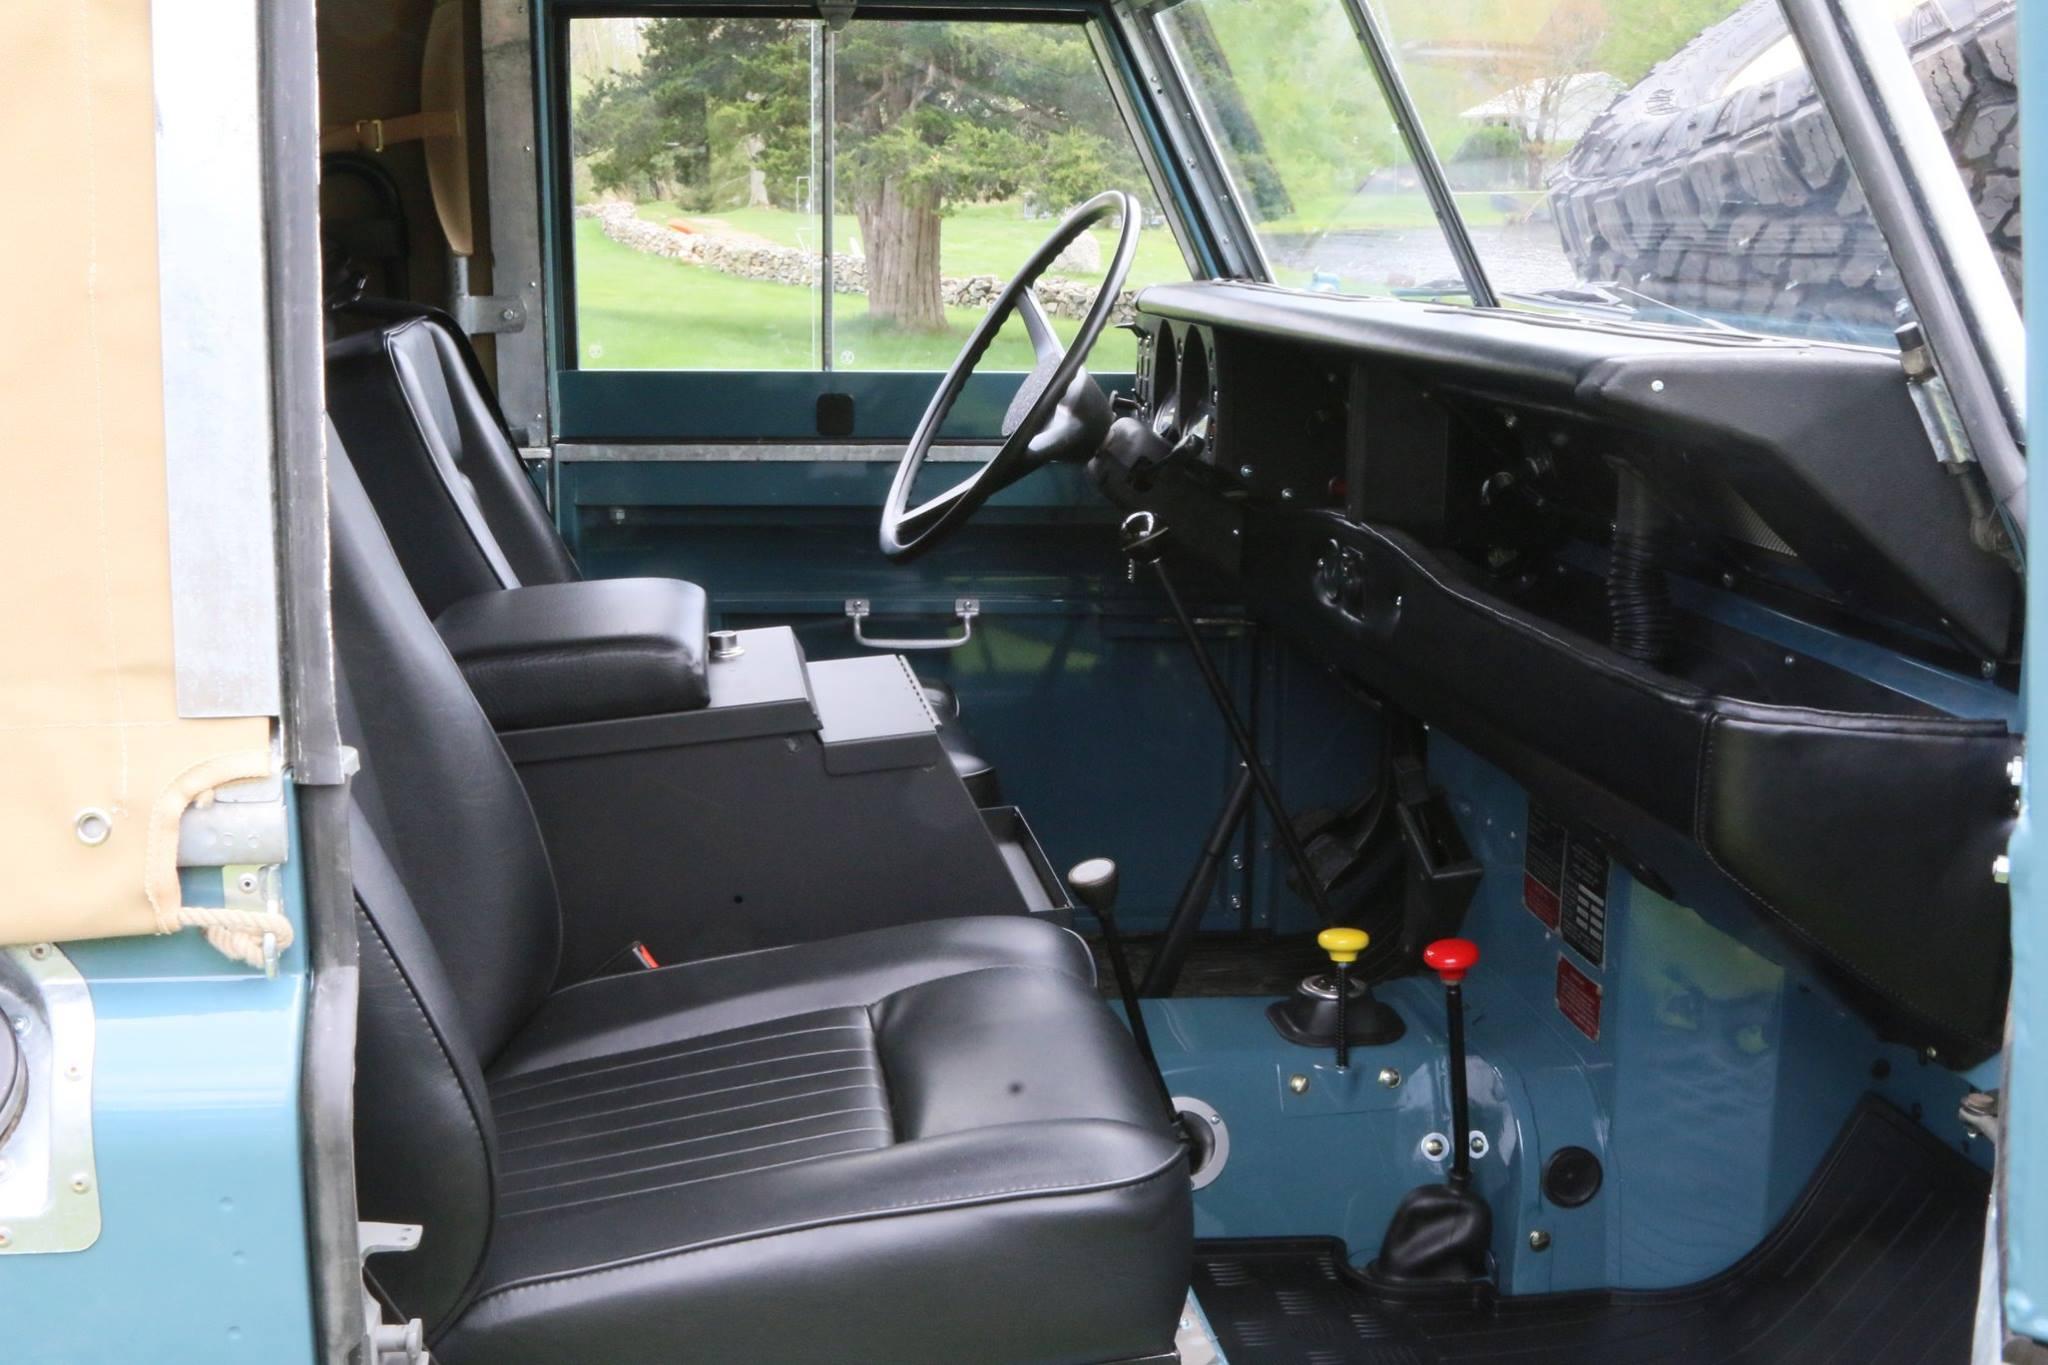 1973 Land Rover Series Iii Marine Blue North America